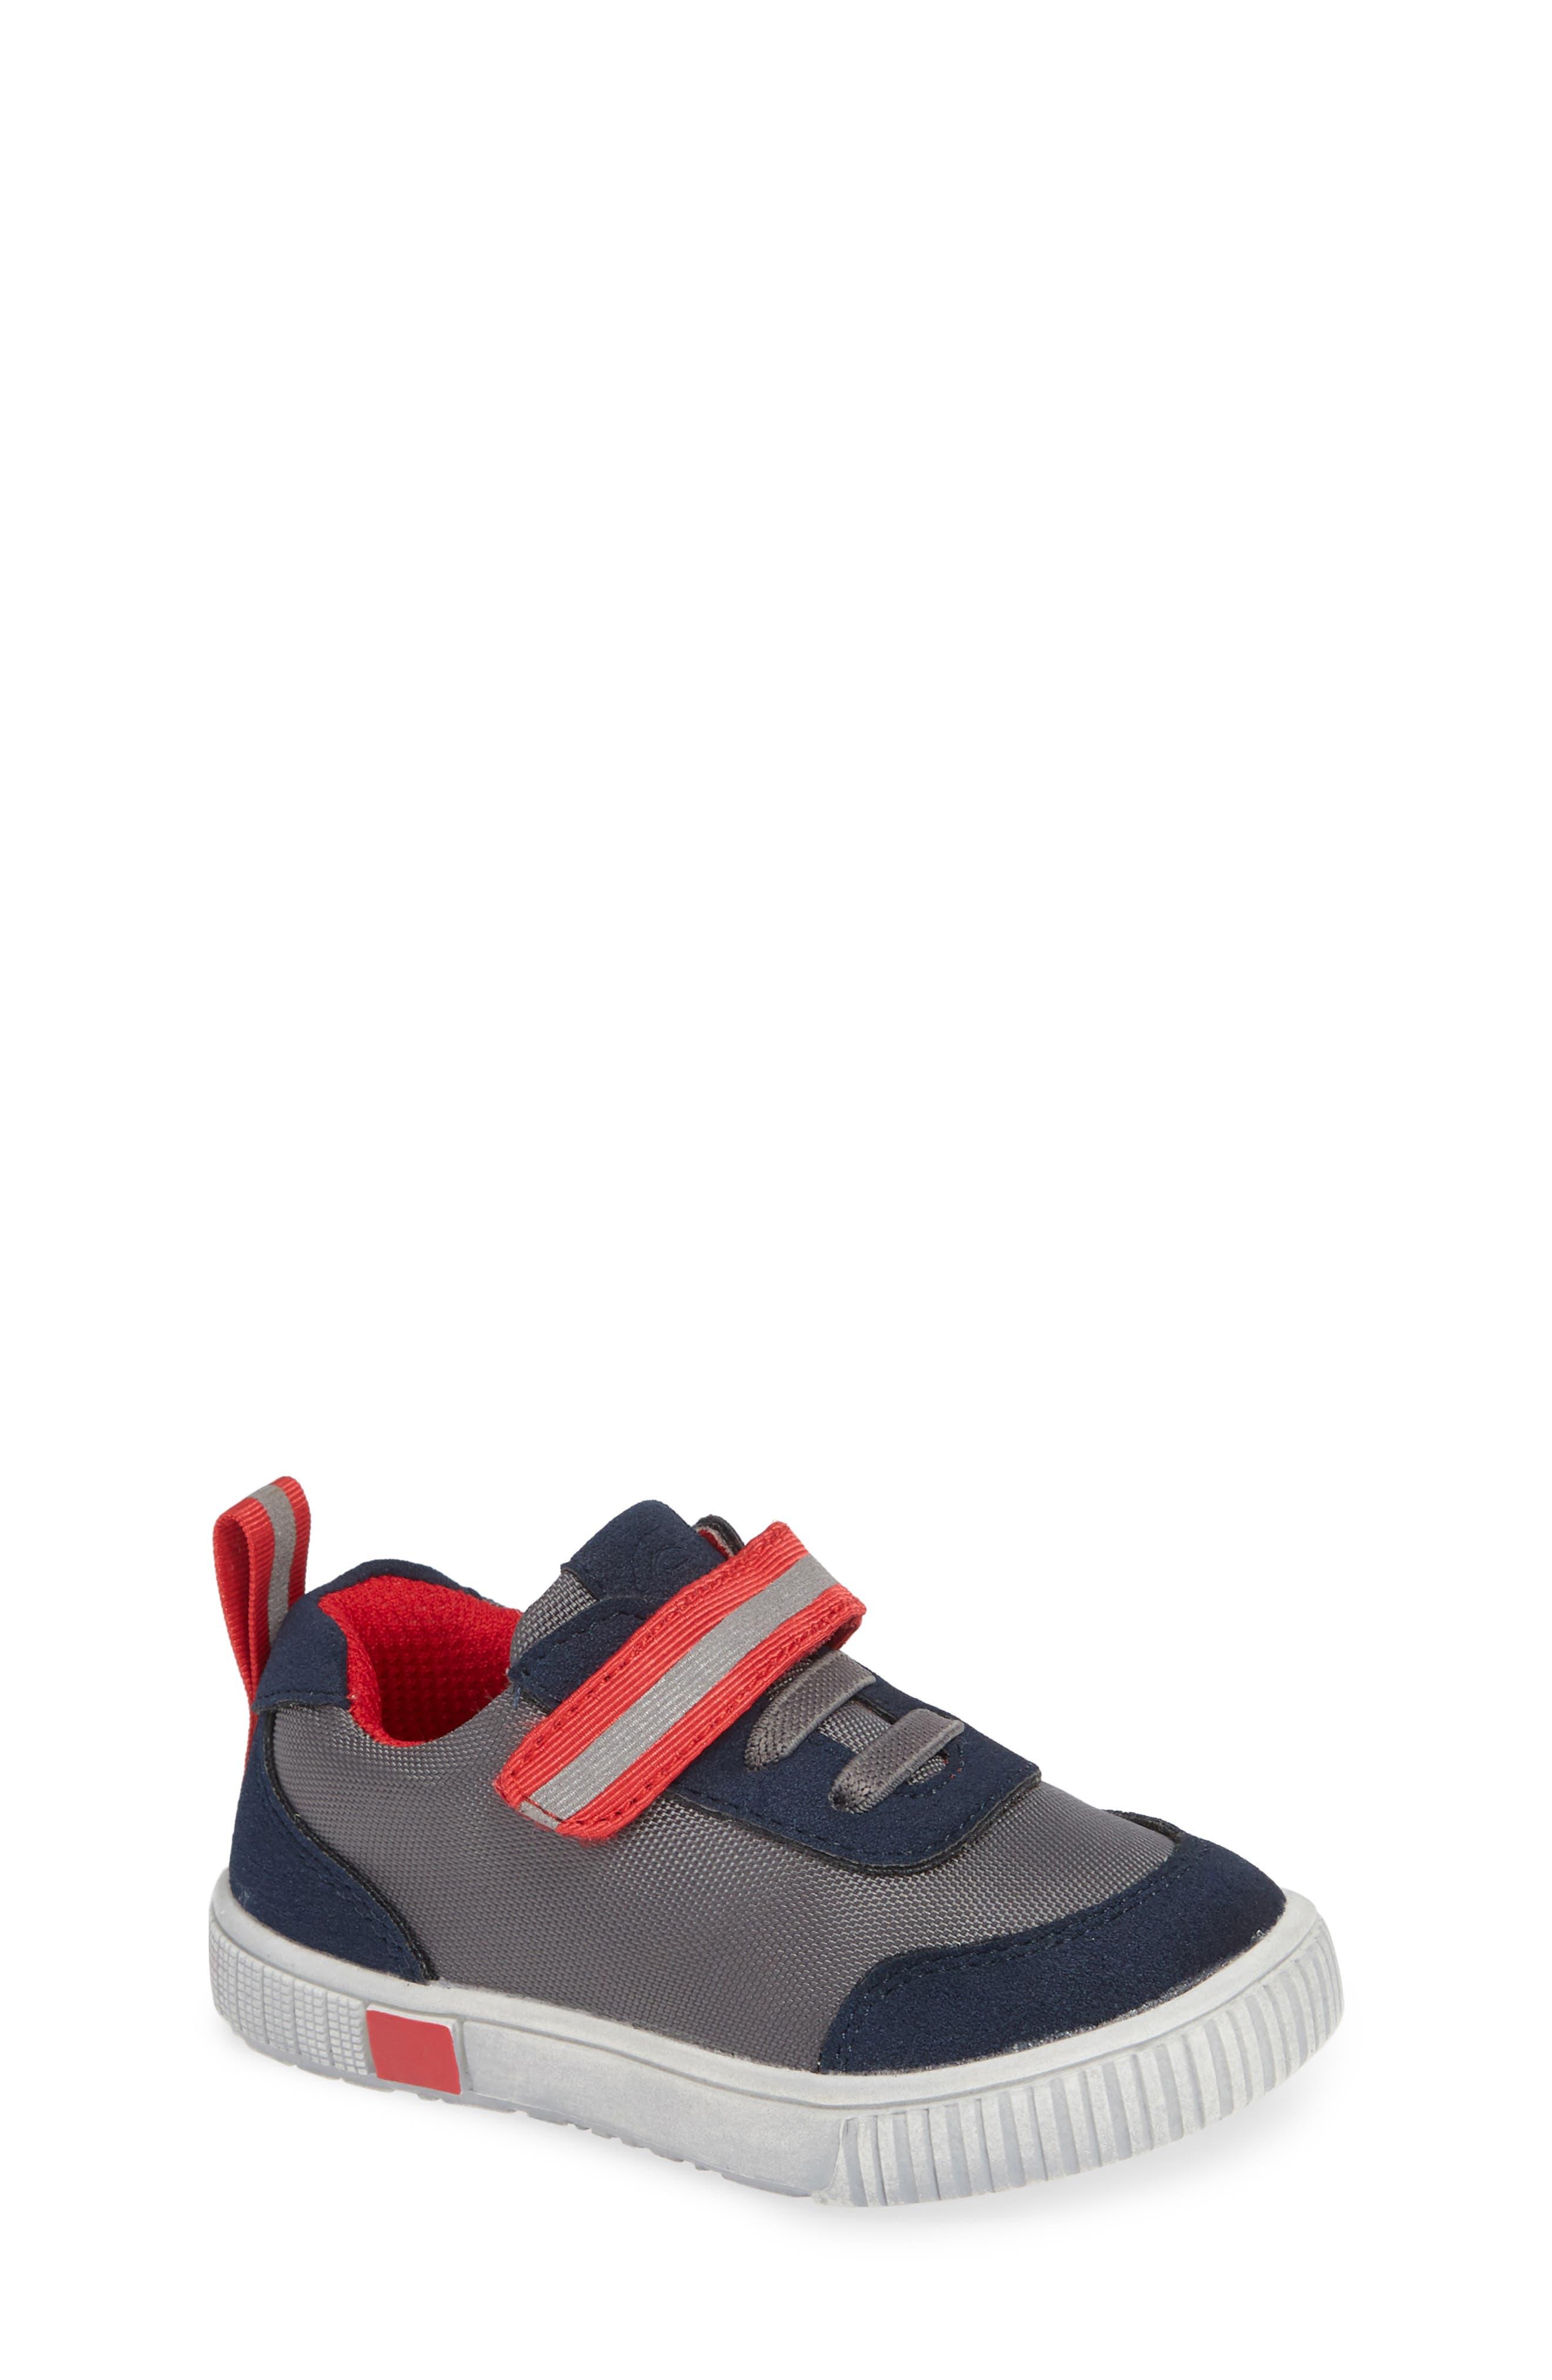 Vault Sneaker,                             Main thumbnail 1, color,                             SLATE GREY